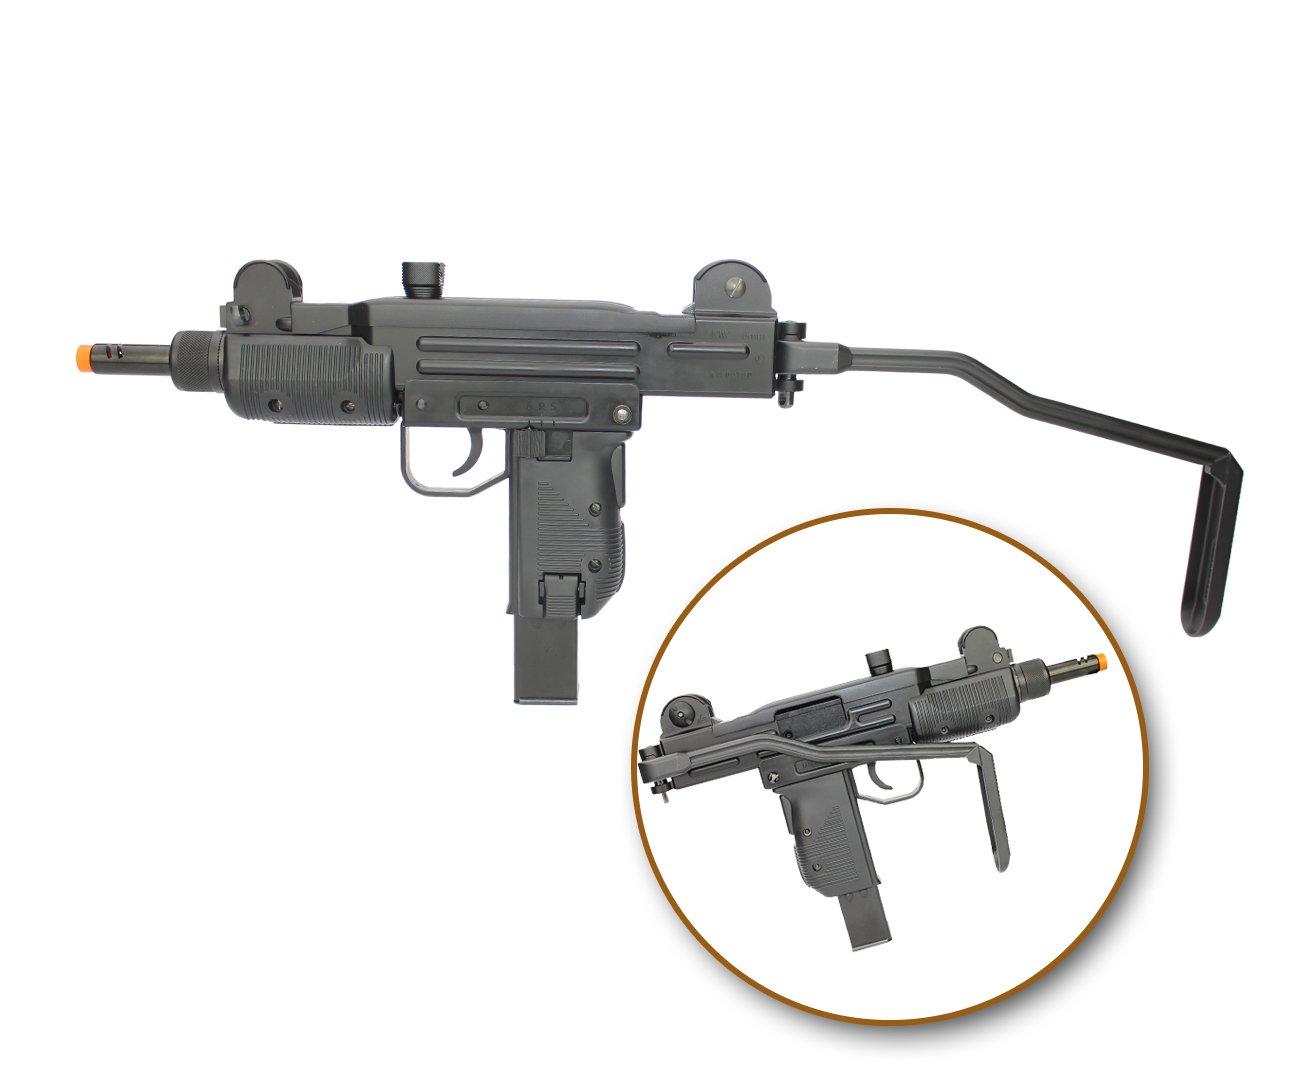 Rifle De Airsoft Co2 Sub-metralhadora Mini Uzi Full Metal Blowback 6.0mm Kwc